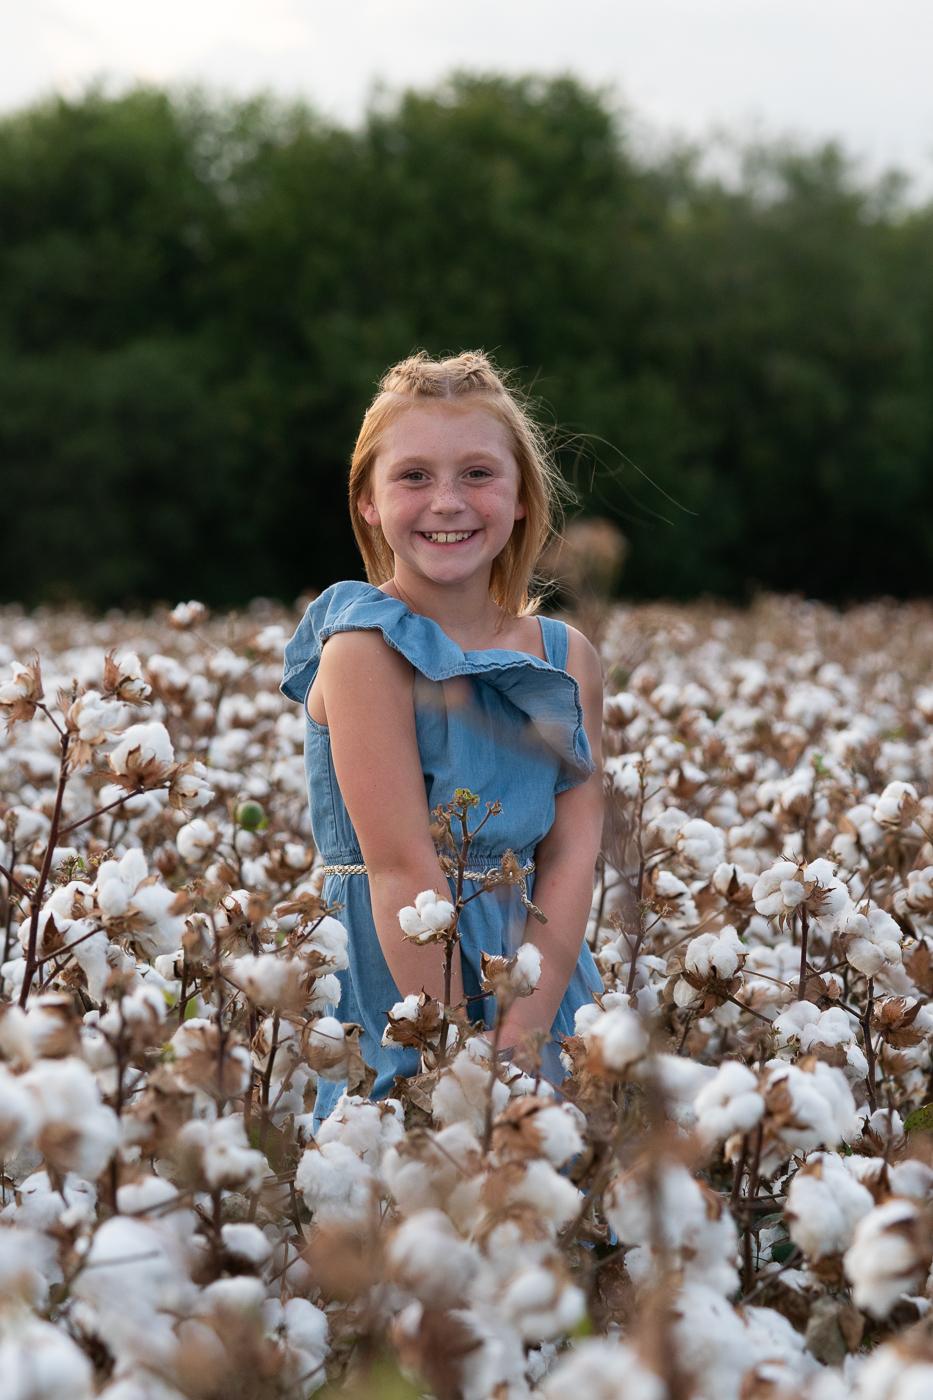 cotton-field-family-portrait-mini-session-san-antonio-lytle-6.jpg